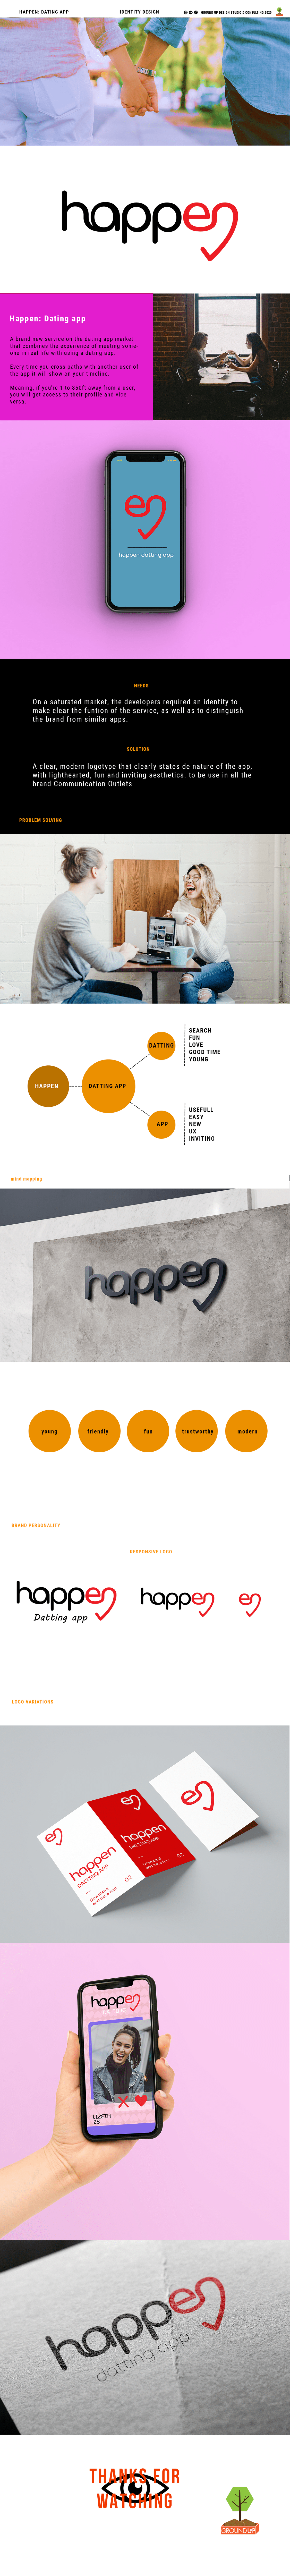 app datting design identity logo